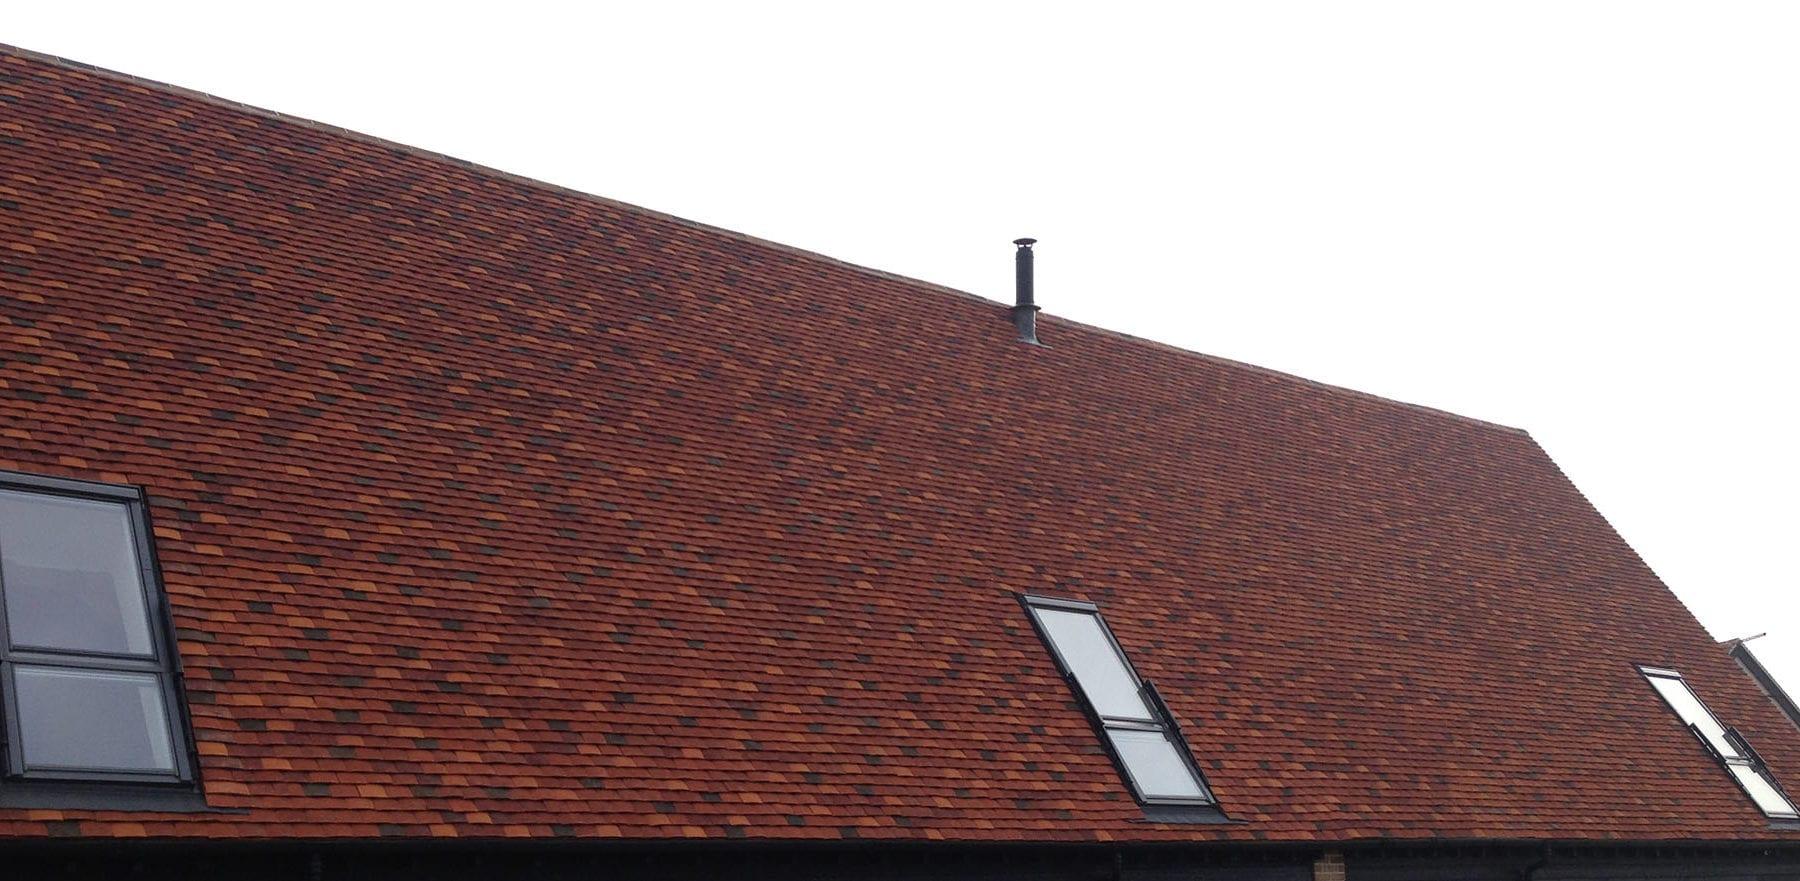 Lifestiles - Handmade Multi Clay Roof Tiles - De Vere, England 5